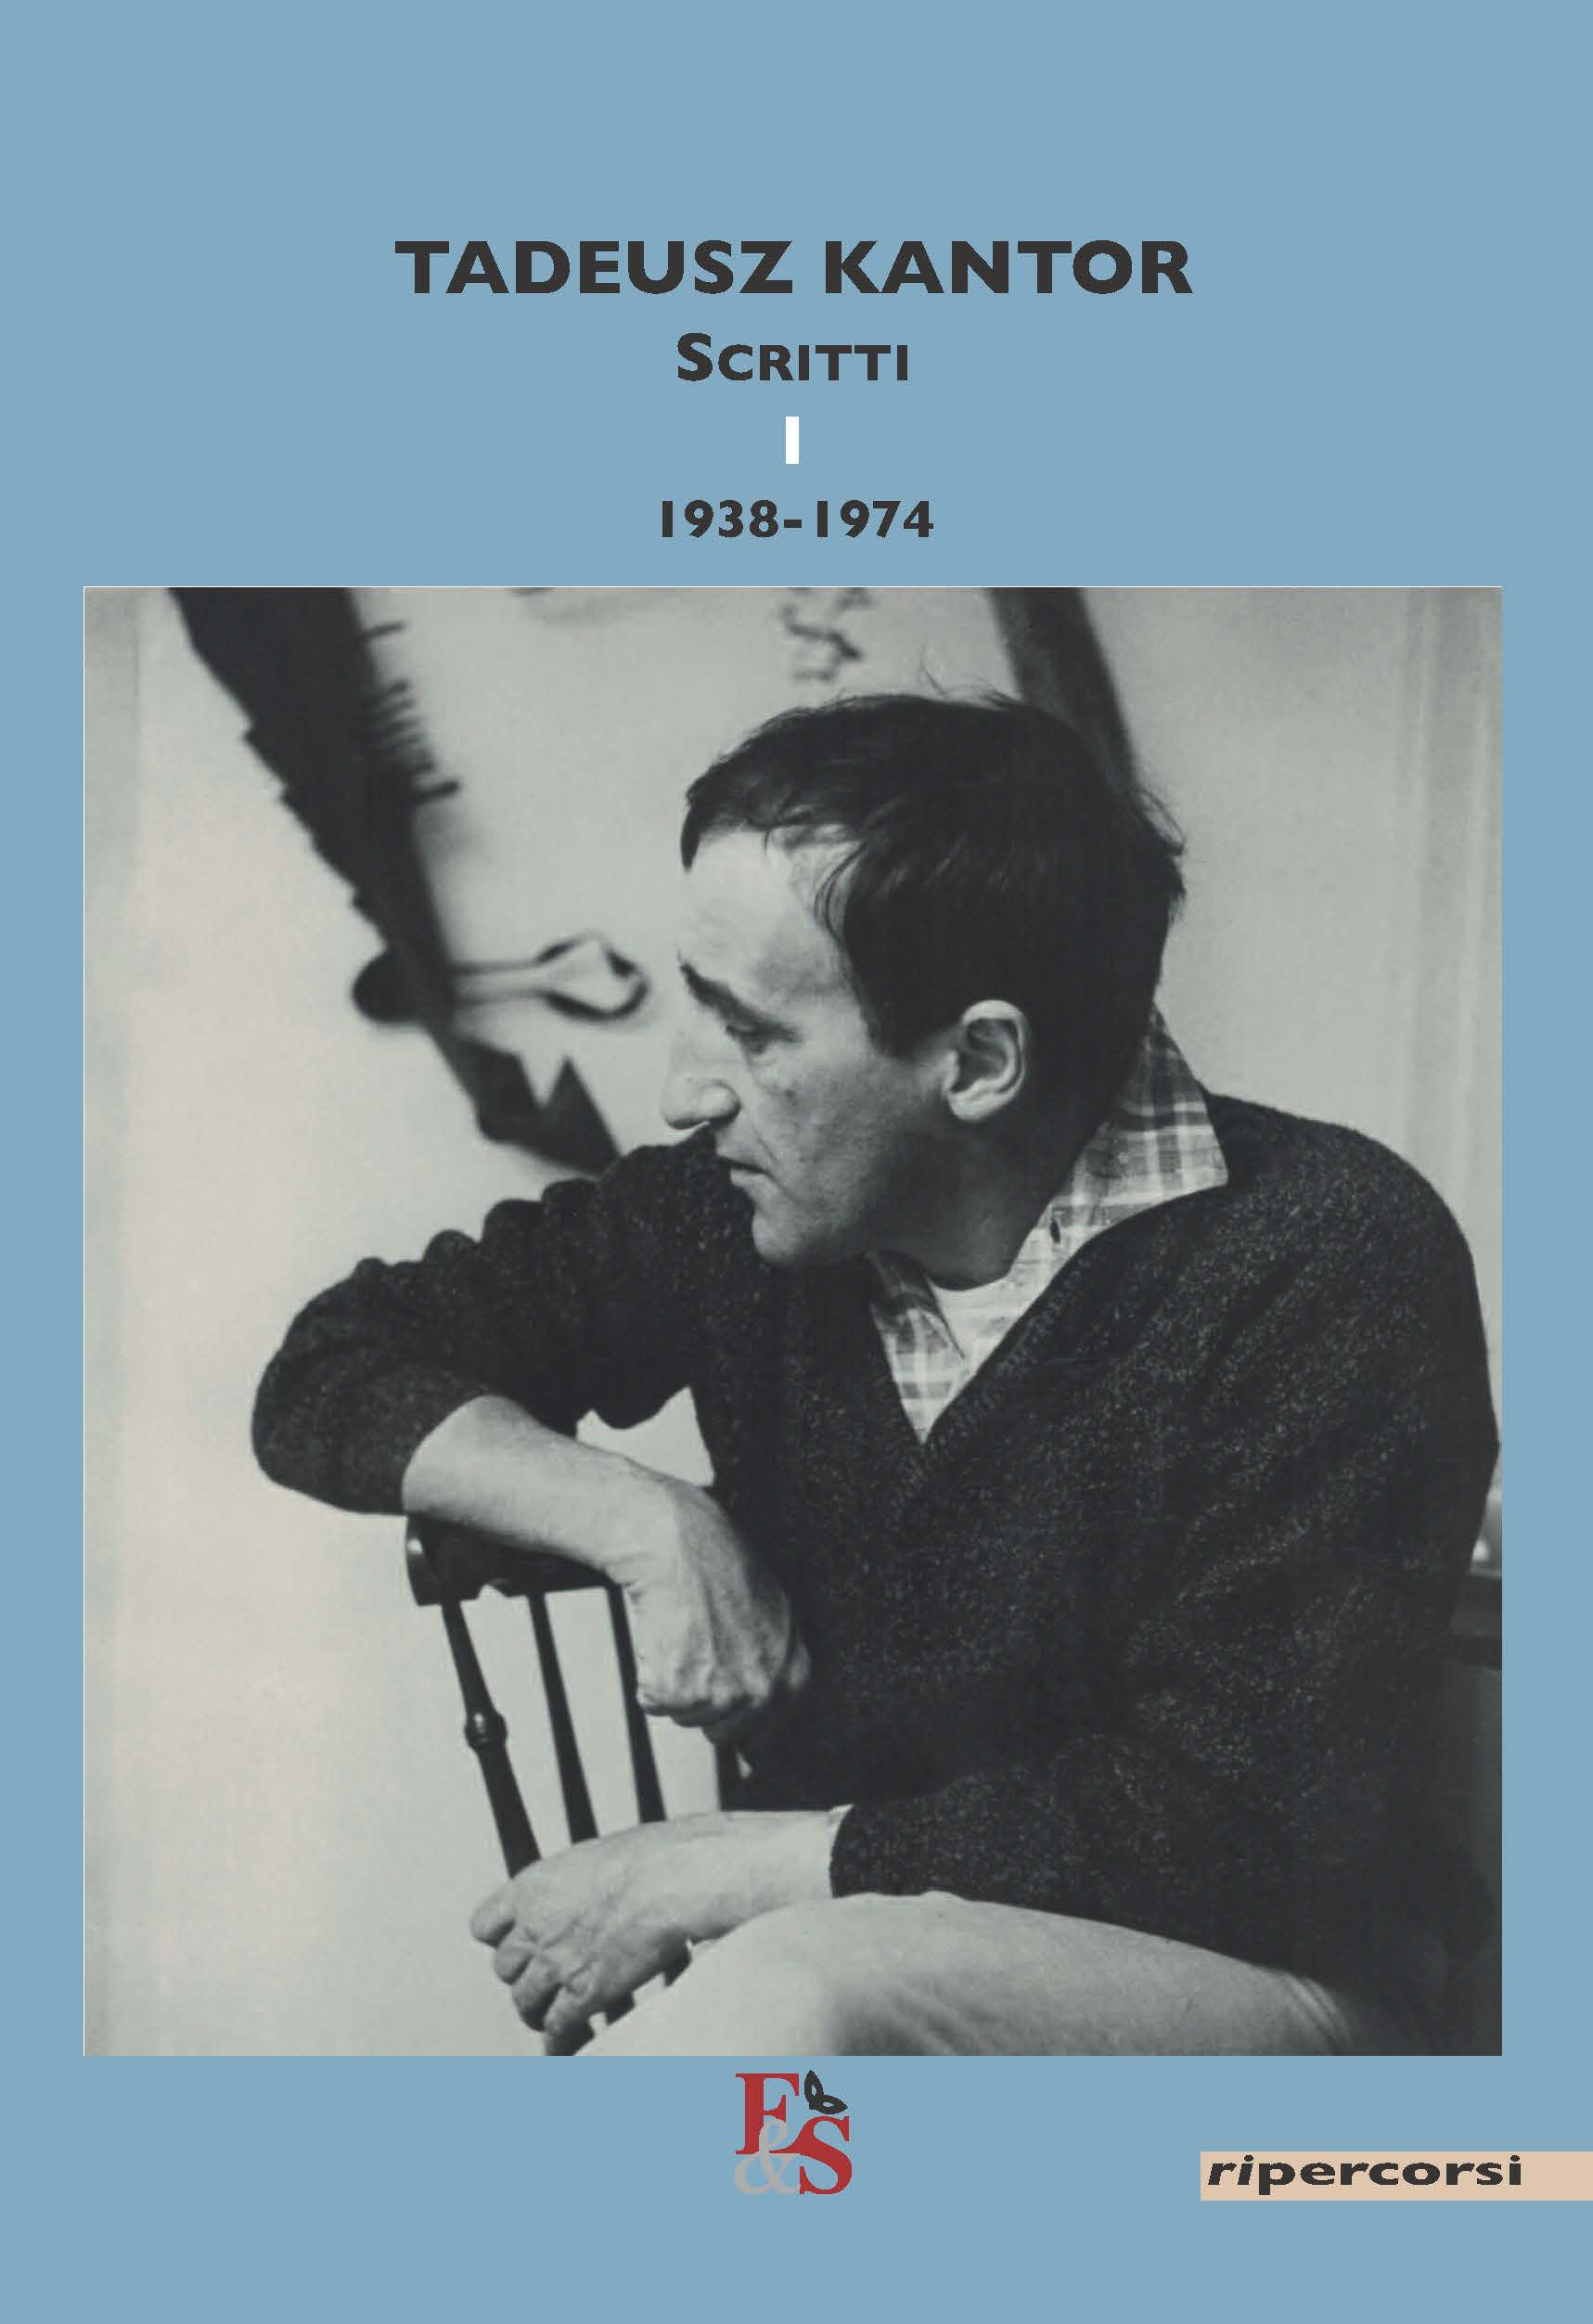 Tadeusz Kantor. Scritti vol. 1: 1938-1974